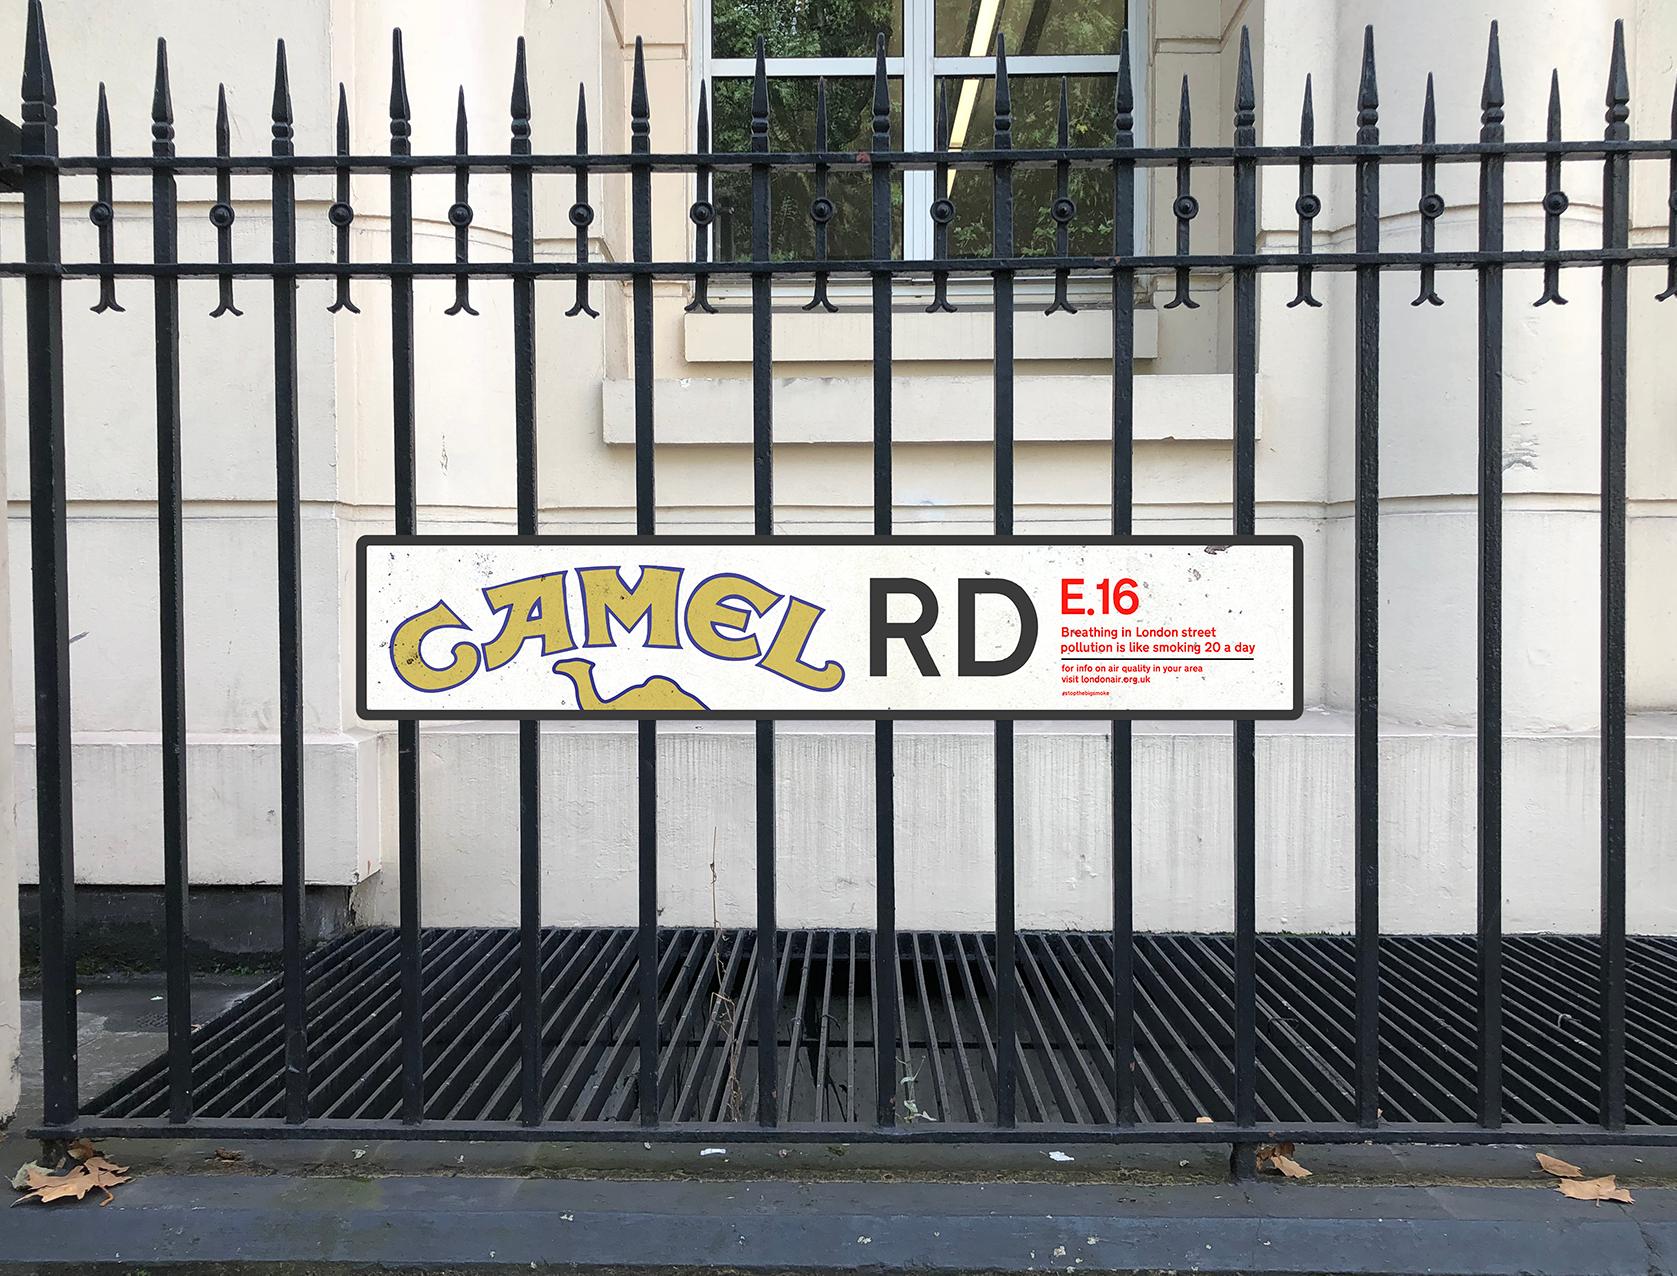 Camel Road, E19